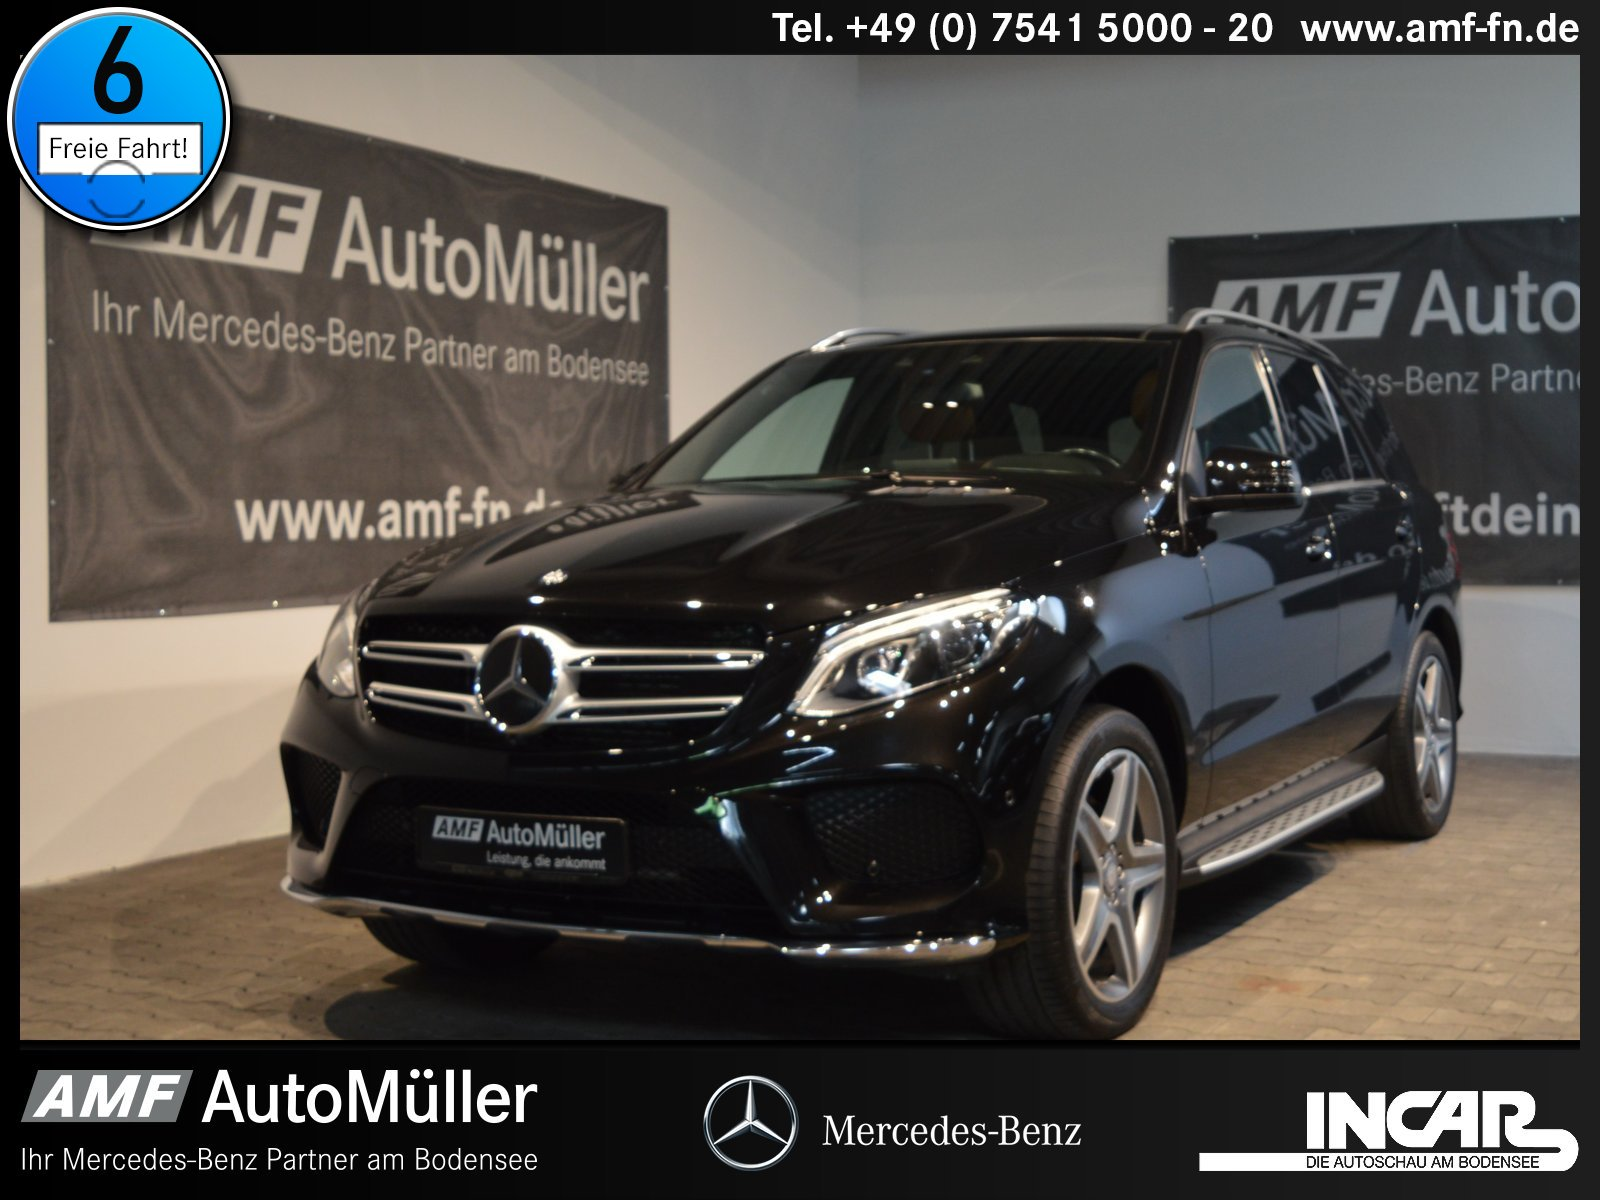 Mercedes-Benz GLE 350 d 4M AMG Line AHK+STANDH.+HUD+PANO+360°+, Jahr 2016, Diesel